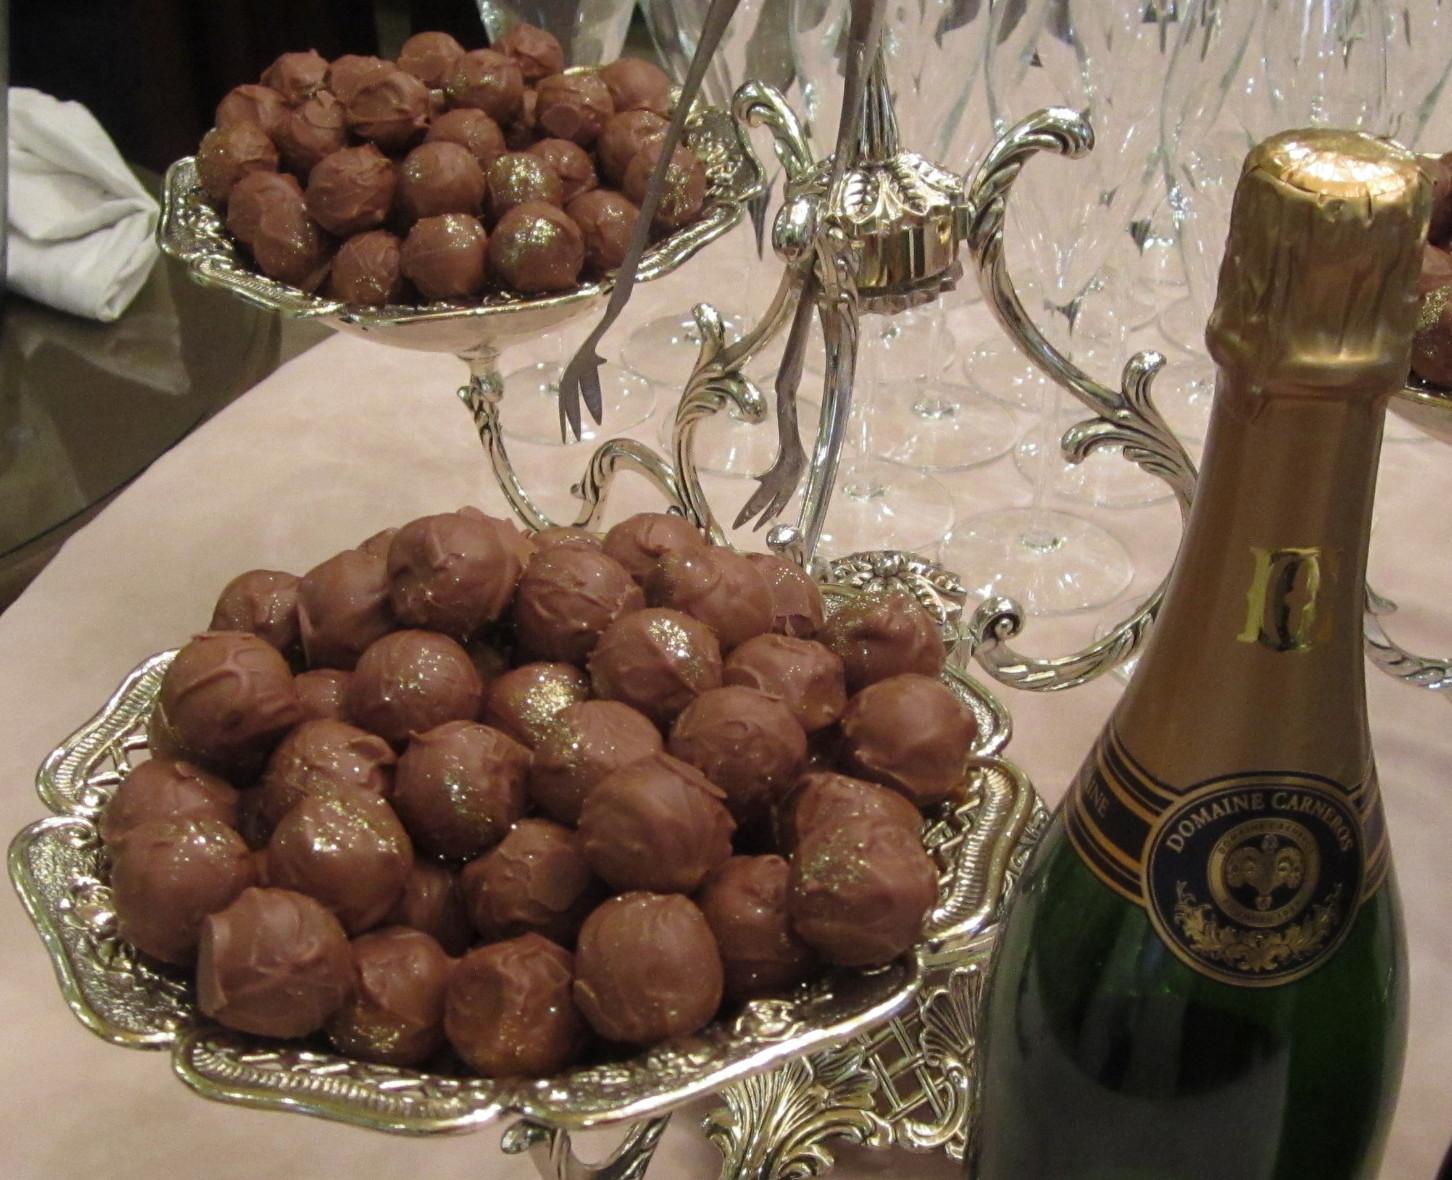 Elaine Travels: Decadent & Delicious Champagne Truffles